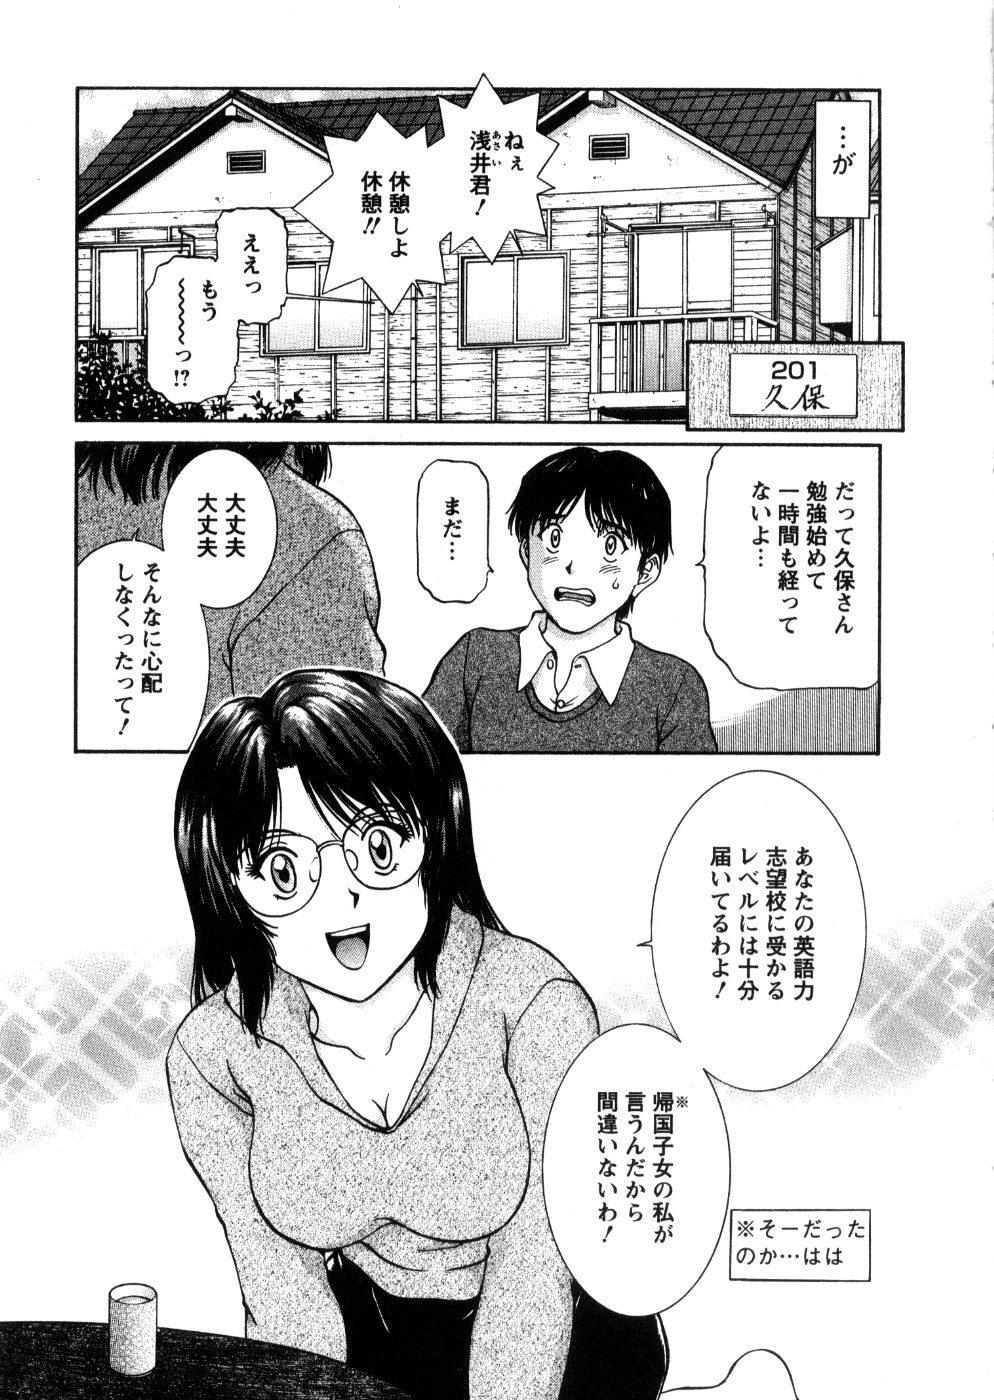 Oneechan-tachi ga Yatte Kuru 03 116